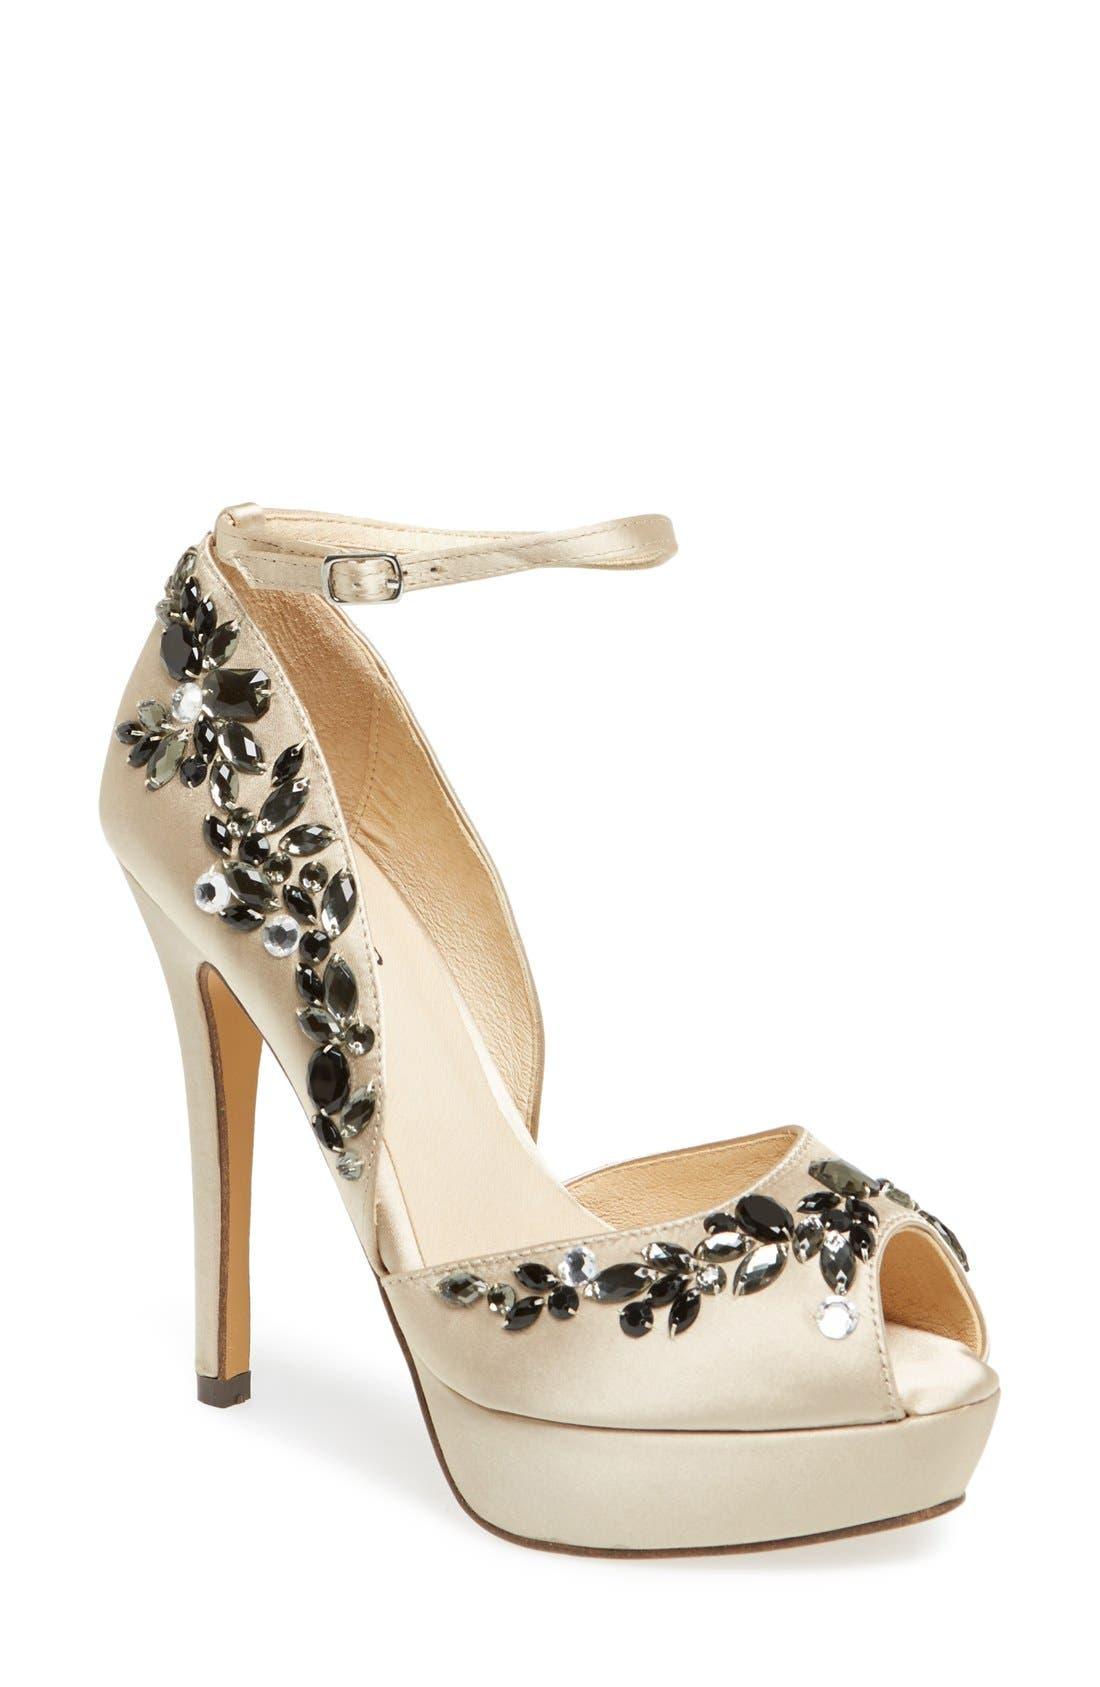 Alternate Image 1 Selected - Menbur 'D Olivet' Platform Ankle Strap Sandal (Women)